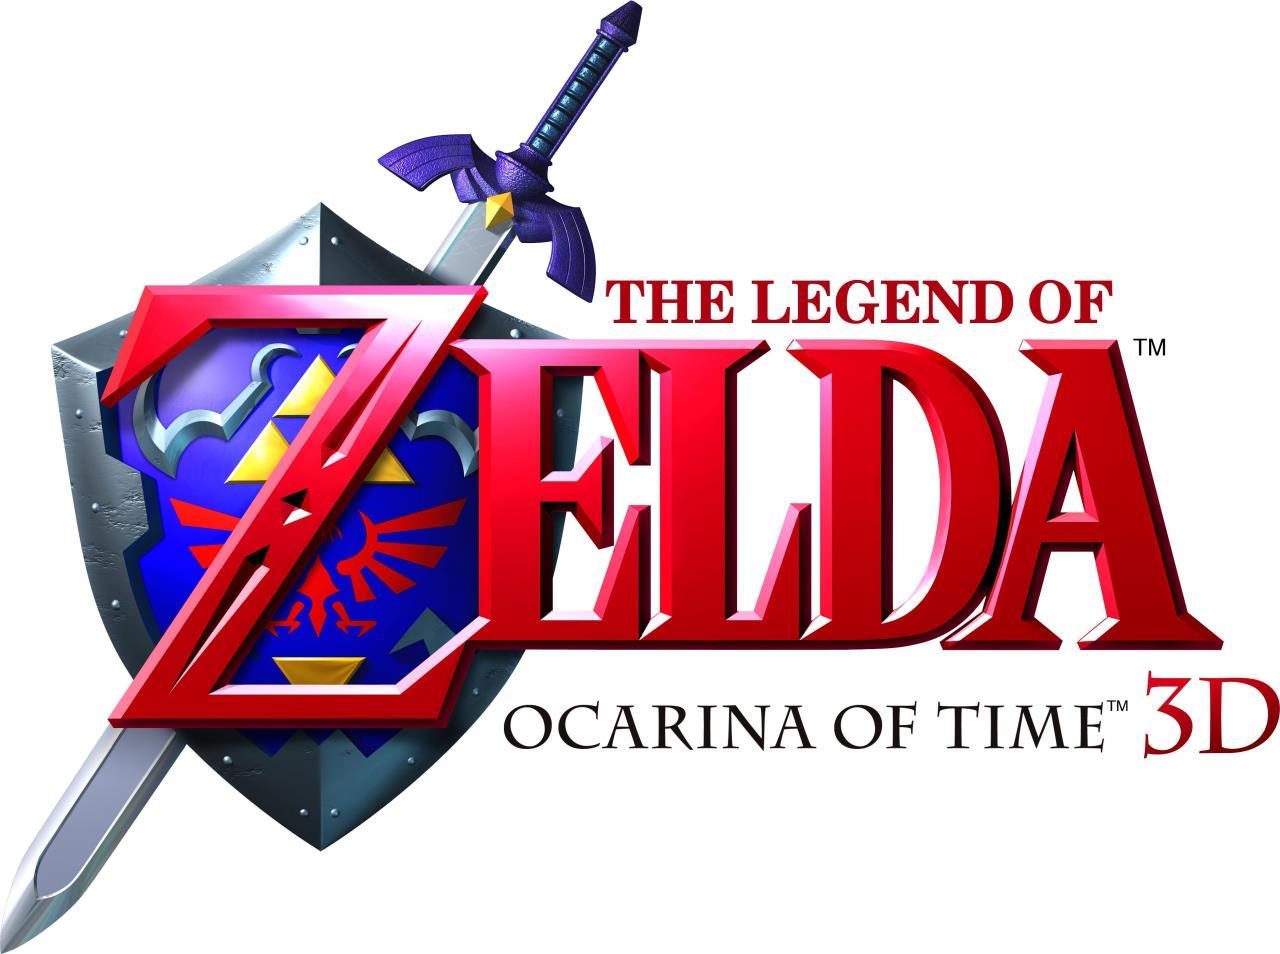 The Legend of Zelda - Ocarina of Time 3D Wallpaper